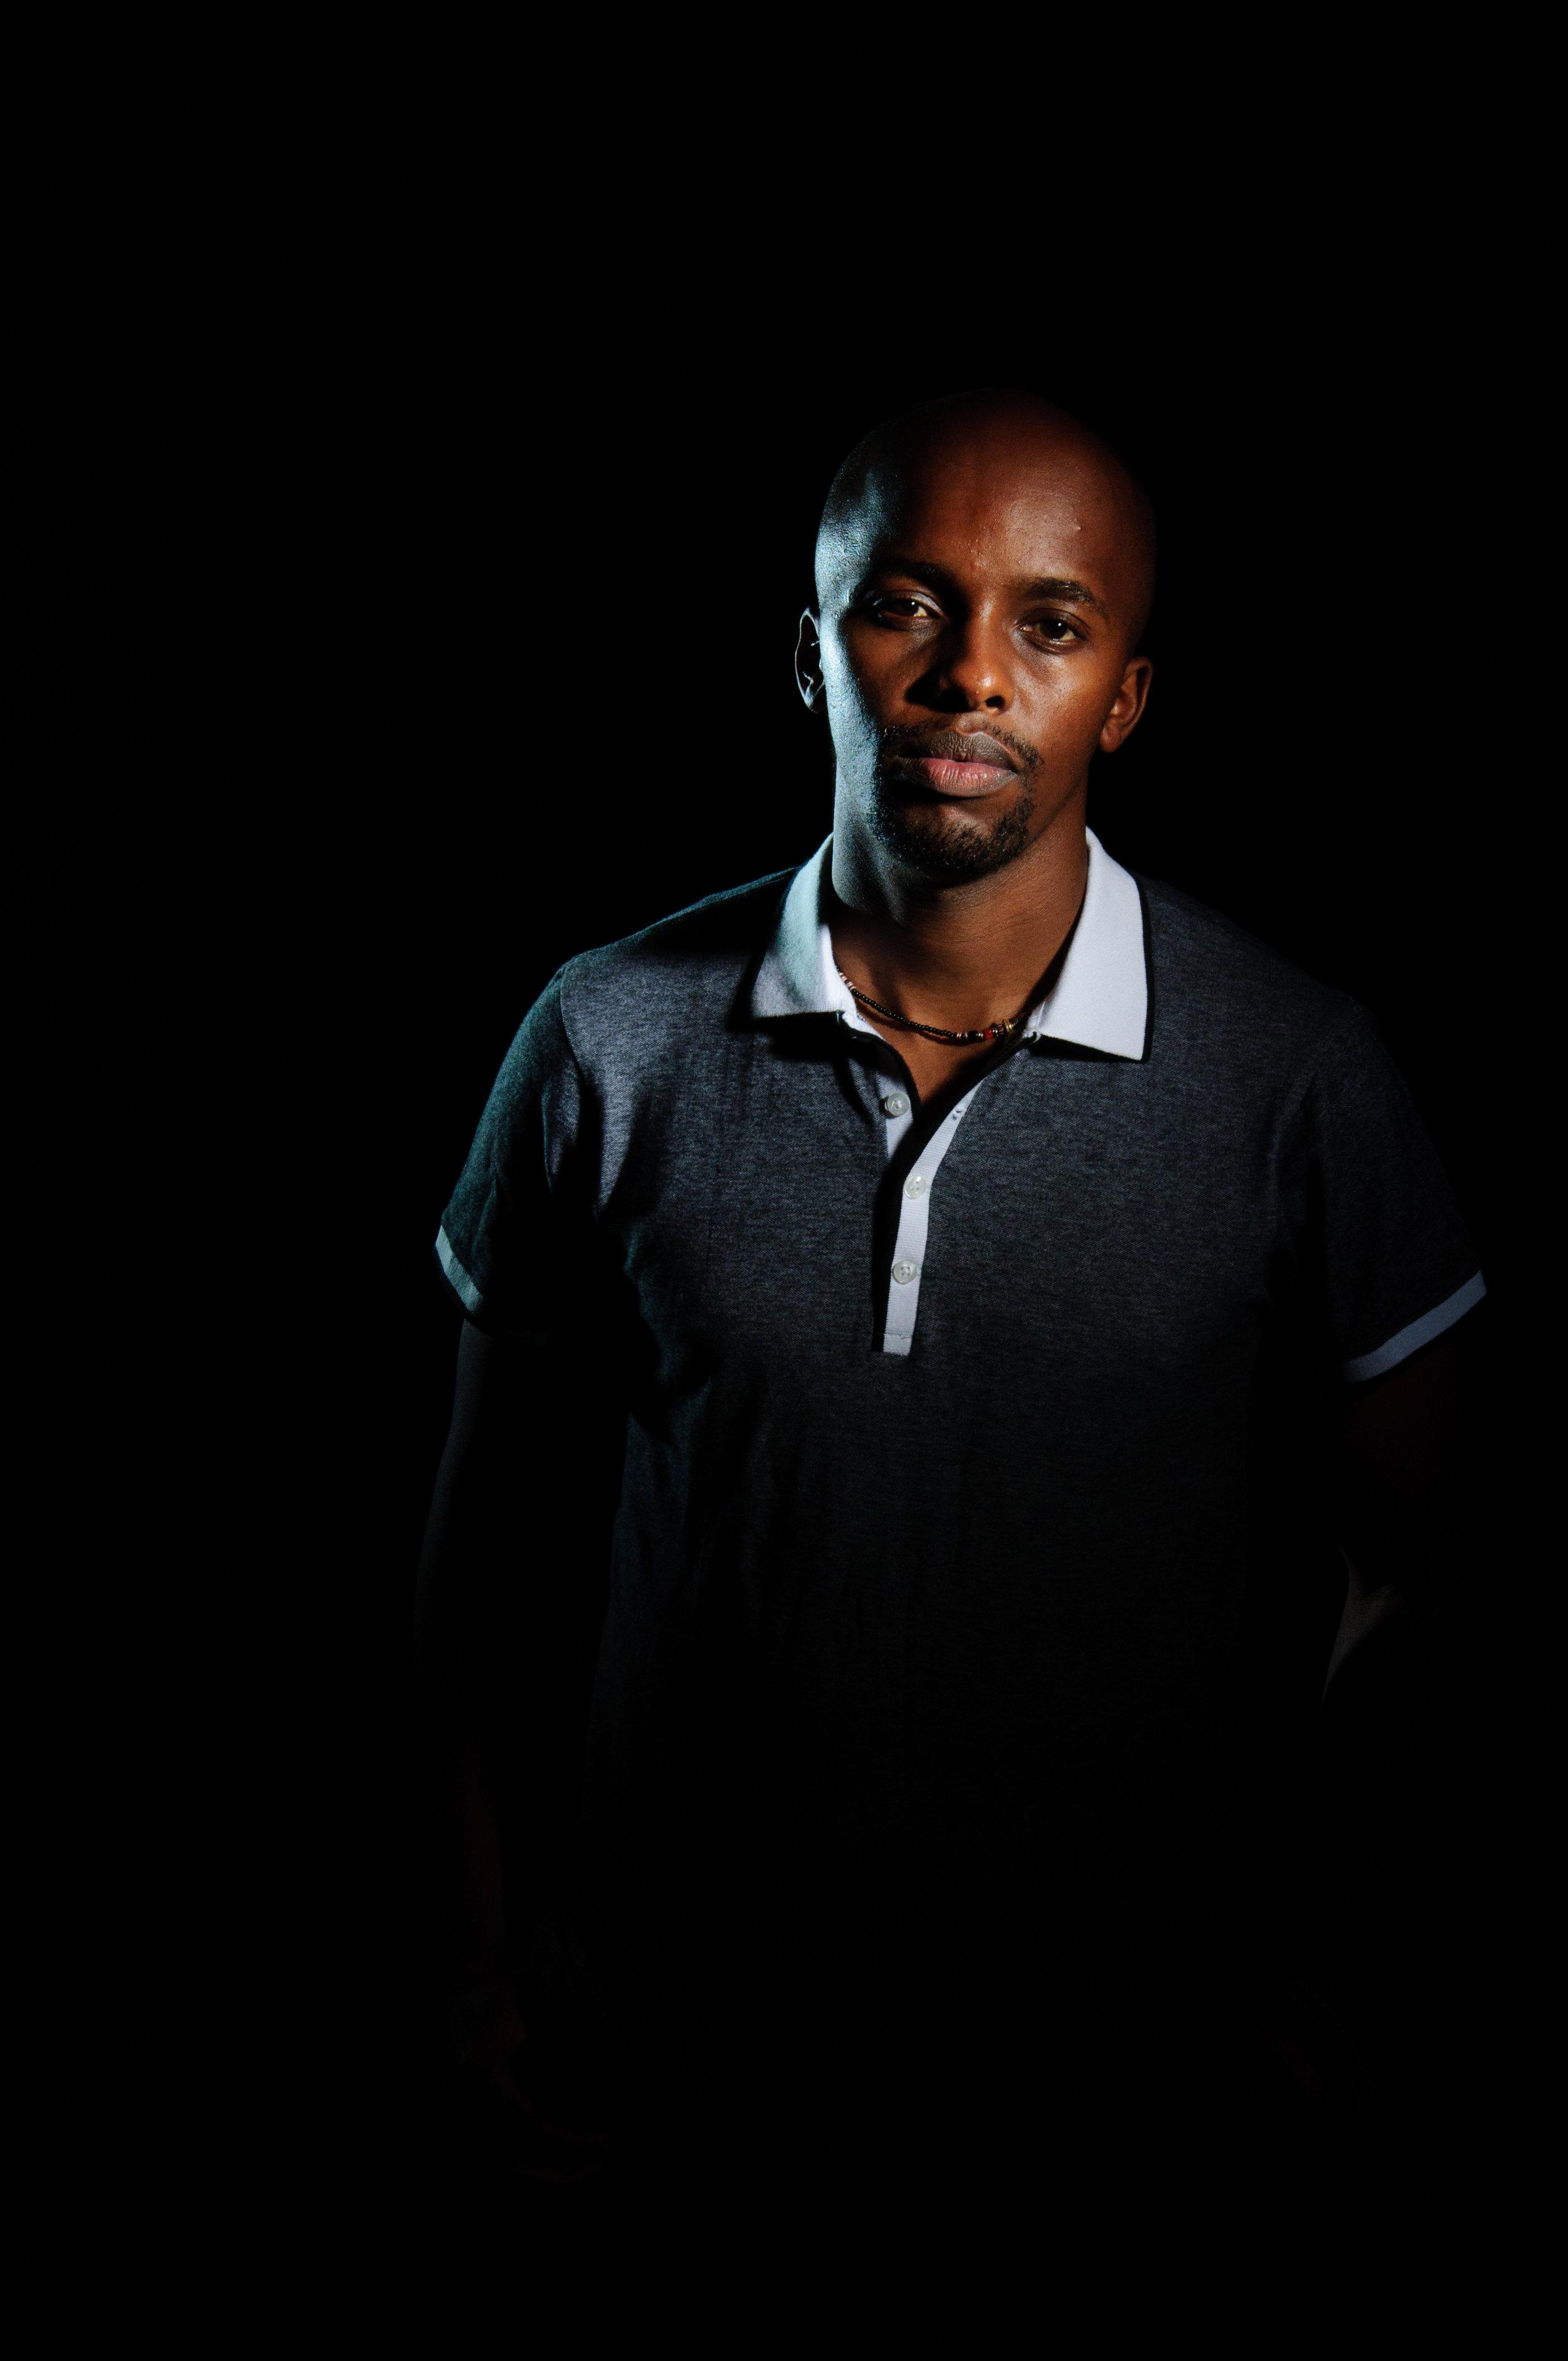 Promotional still from 'Nairobi Half Life' (2012). Jim Chuchu